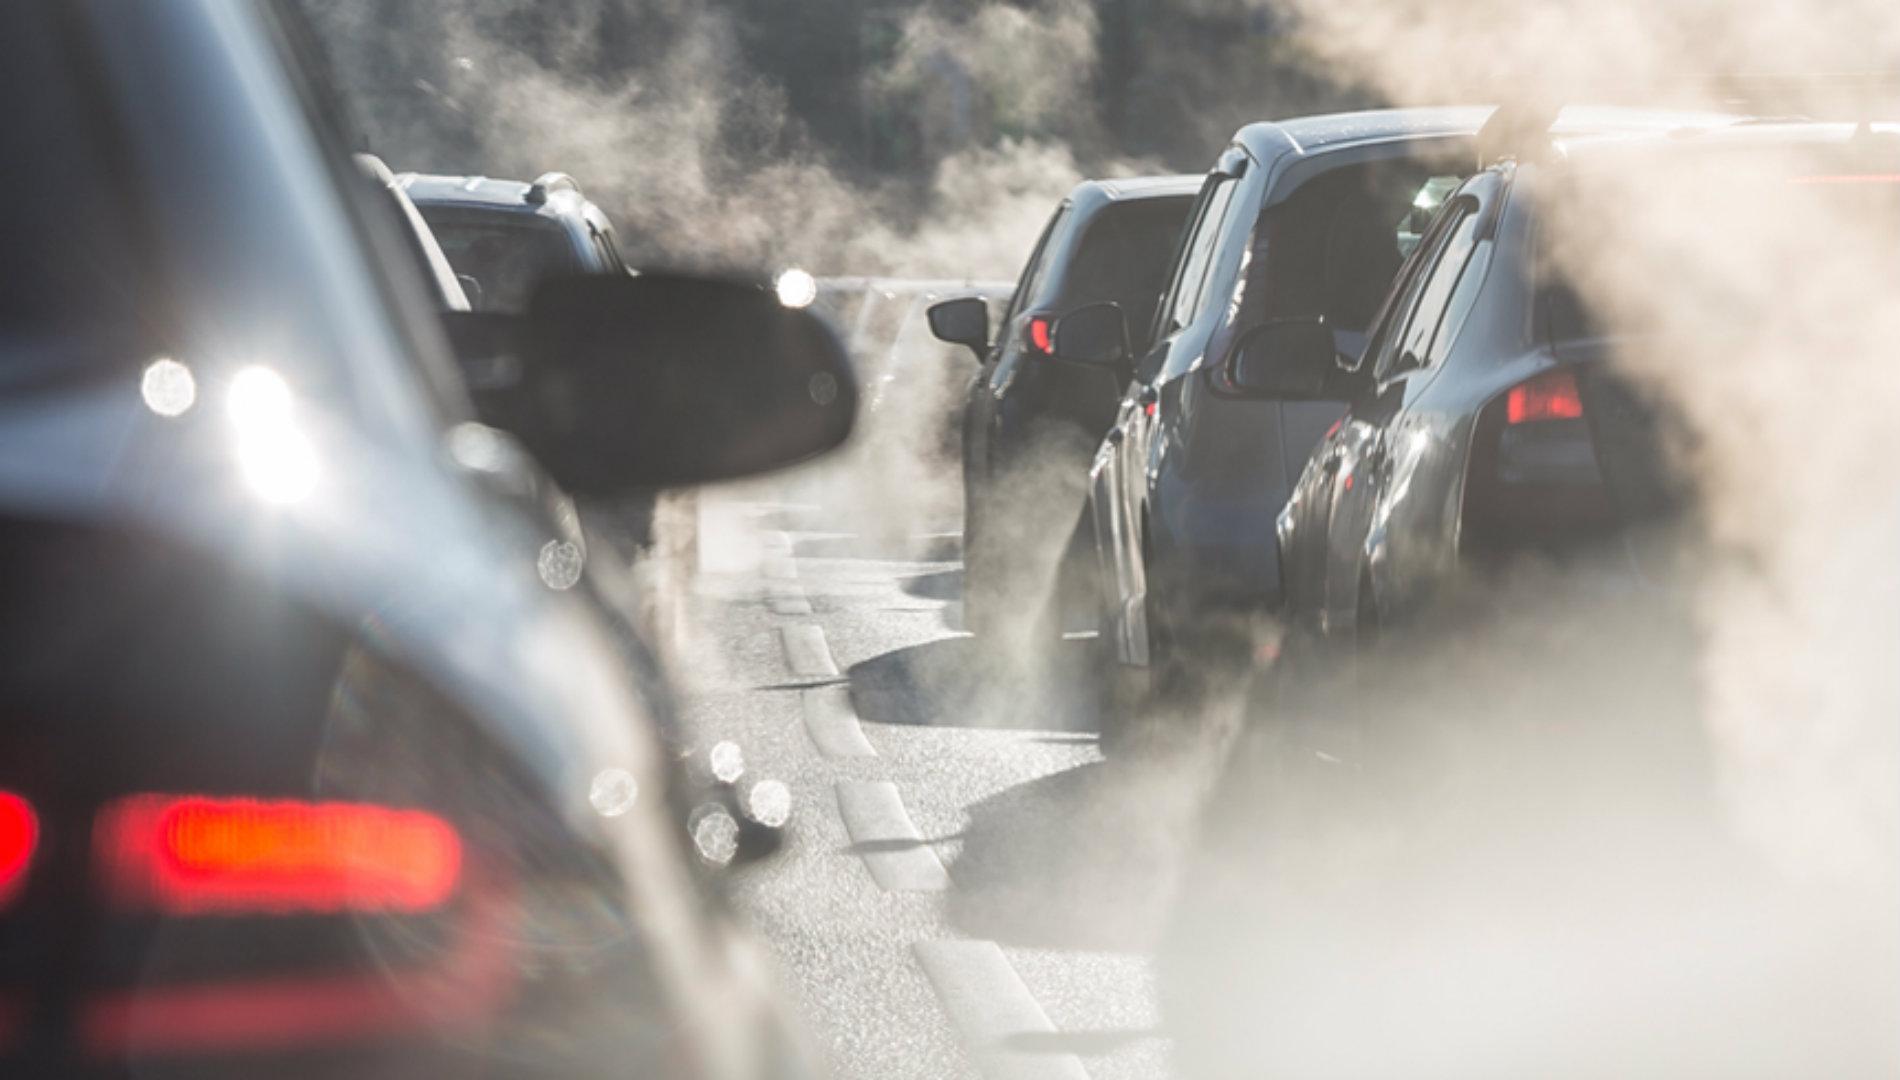 Cars Polluting copy.jpg (181 KB)